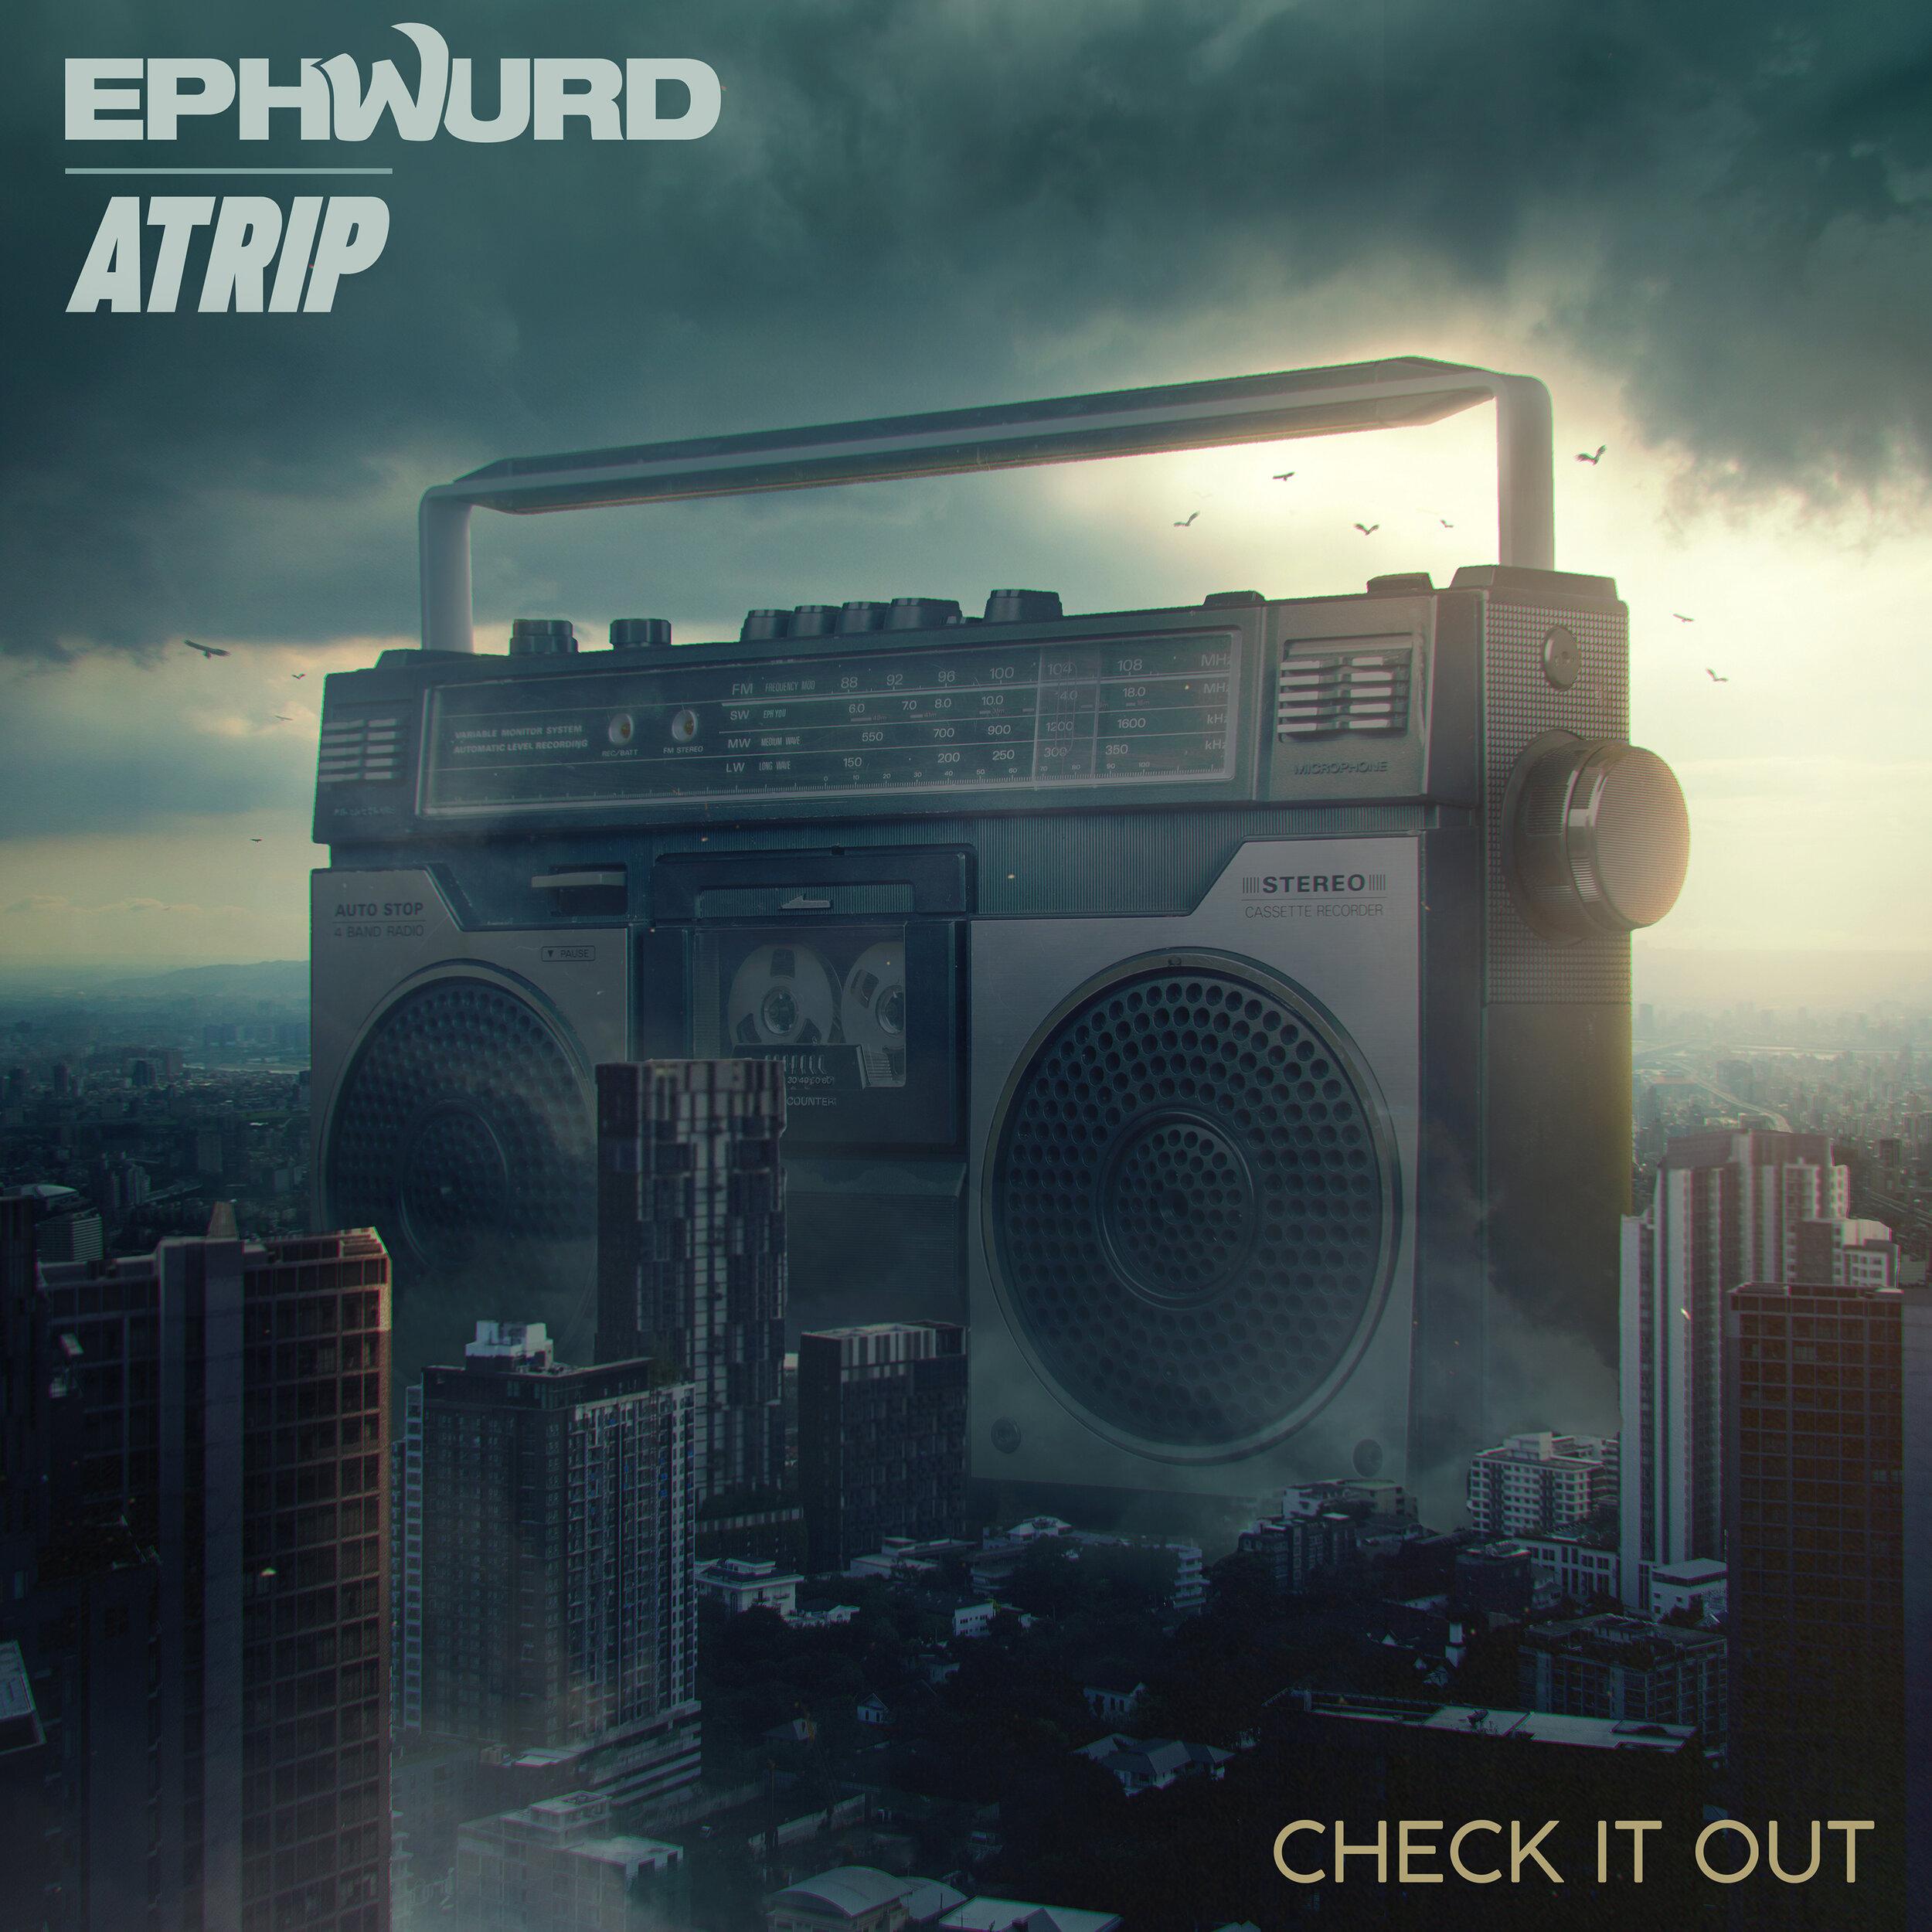 ephwurd_atrip_checkitout_art_3000px.jpg